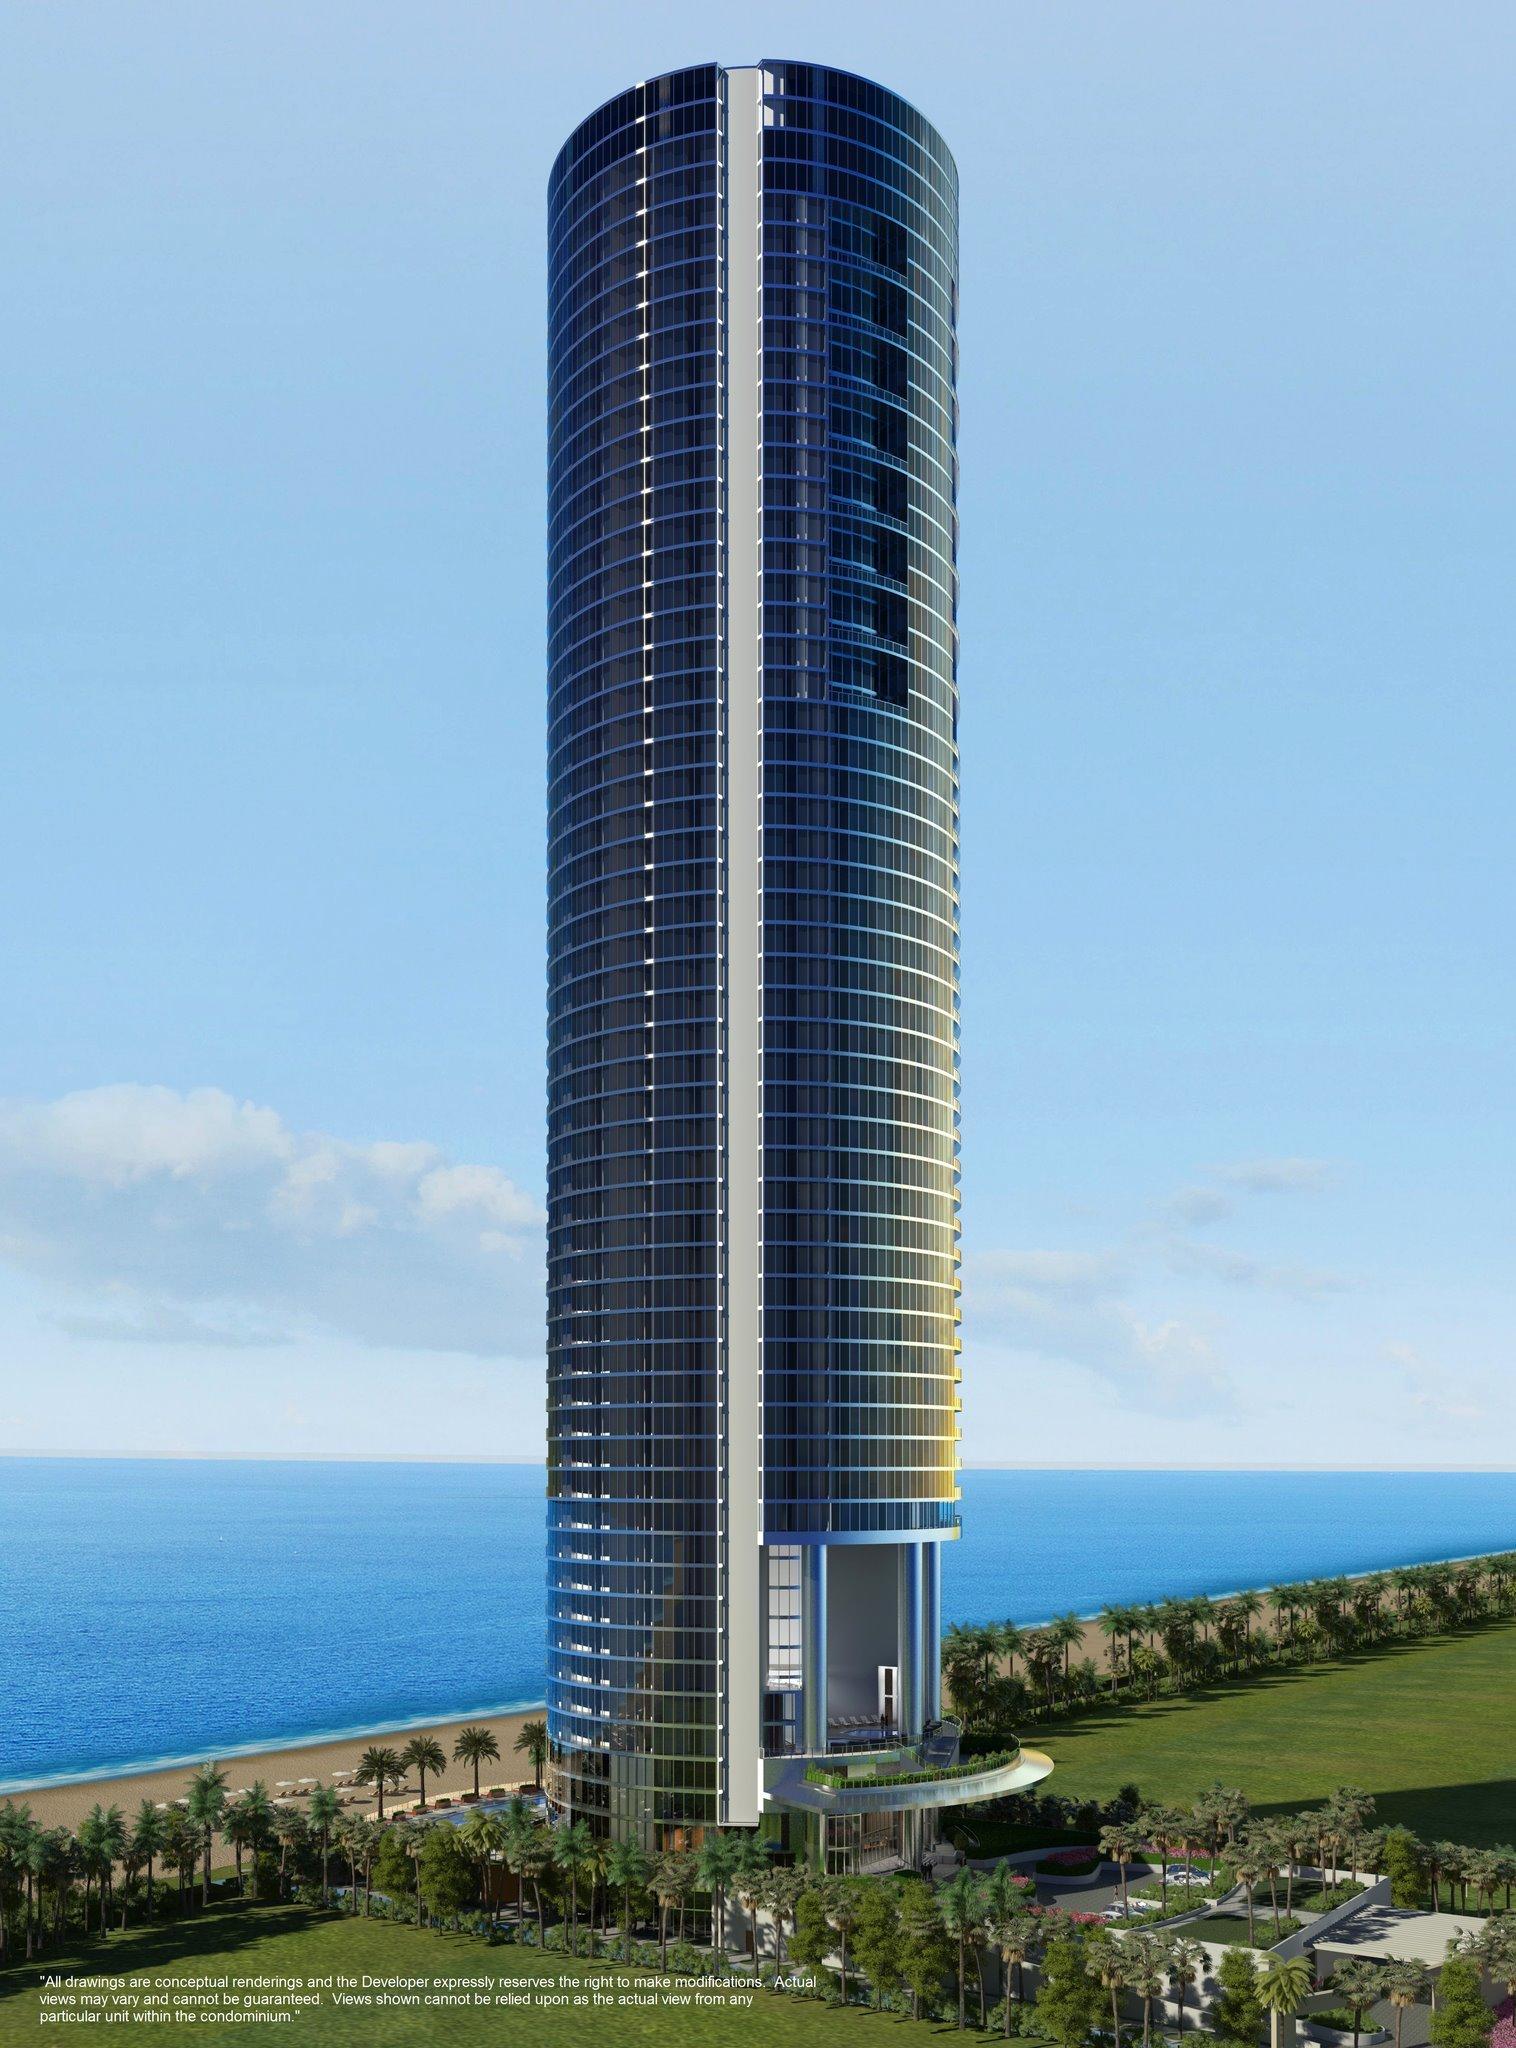 skyview image of Porsche Design Tower